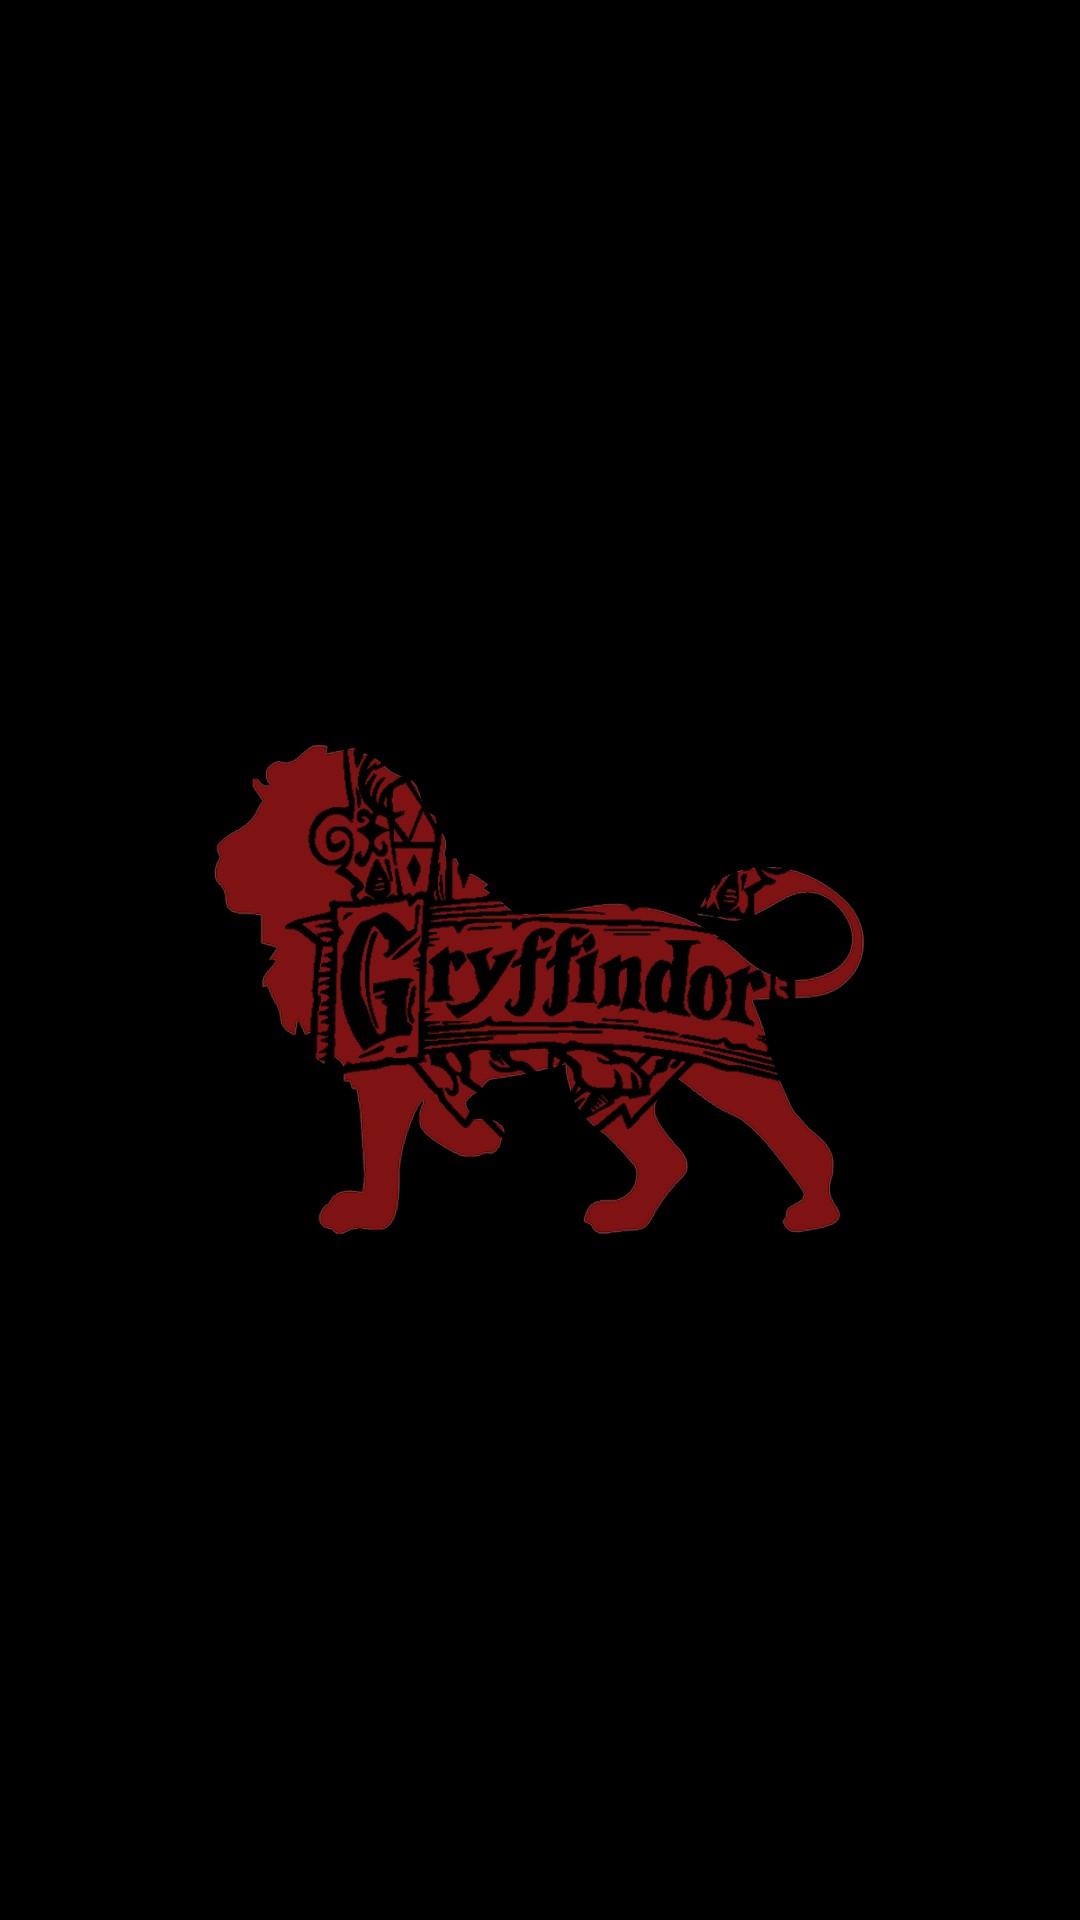 Gryffindor Wallpaper 183 ① Download Free Beautiful High